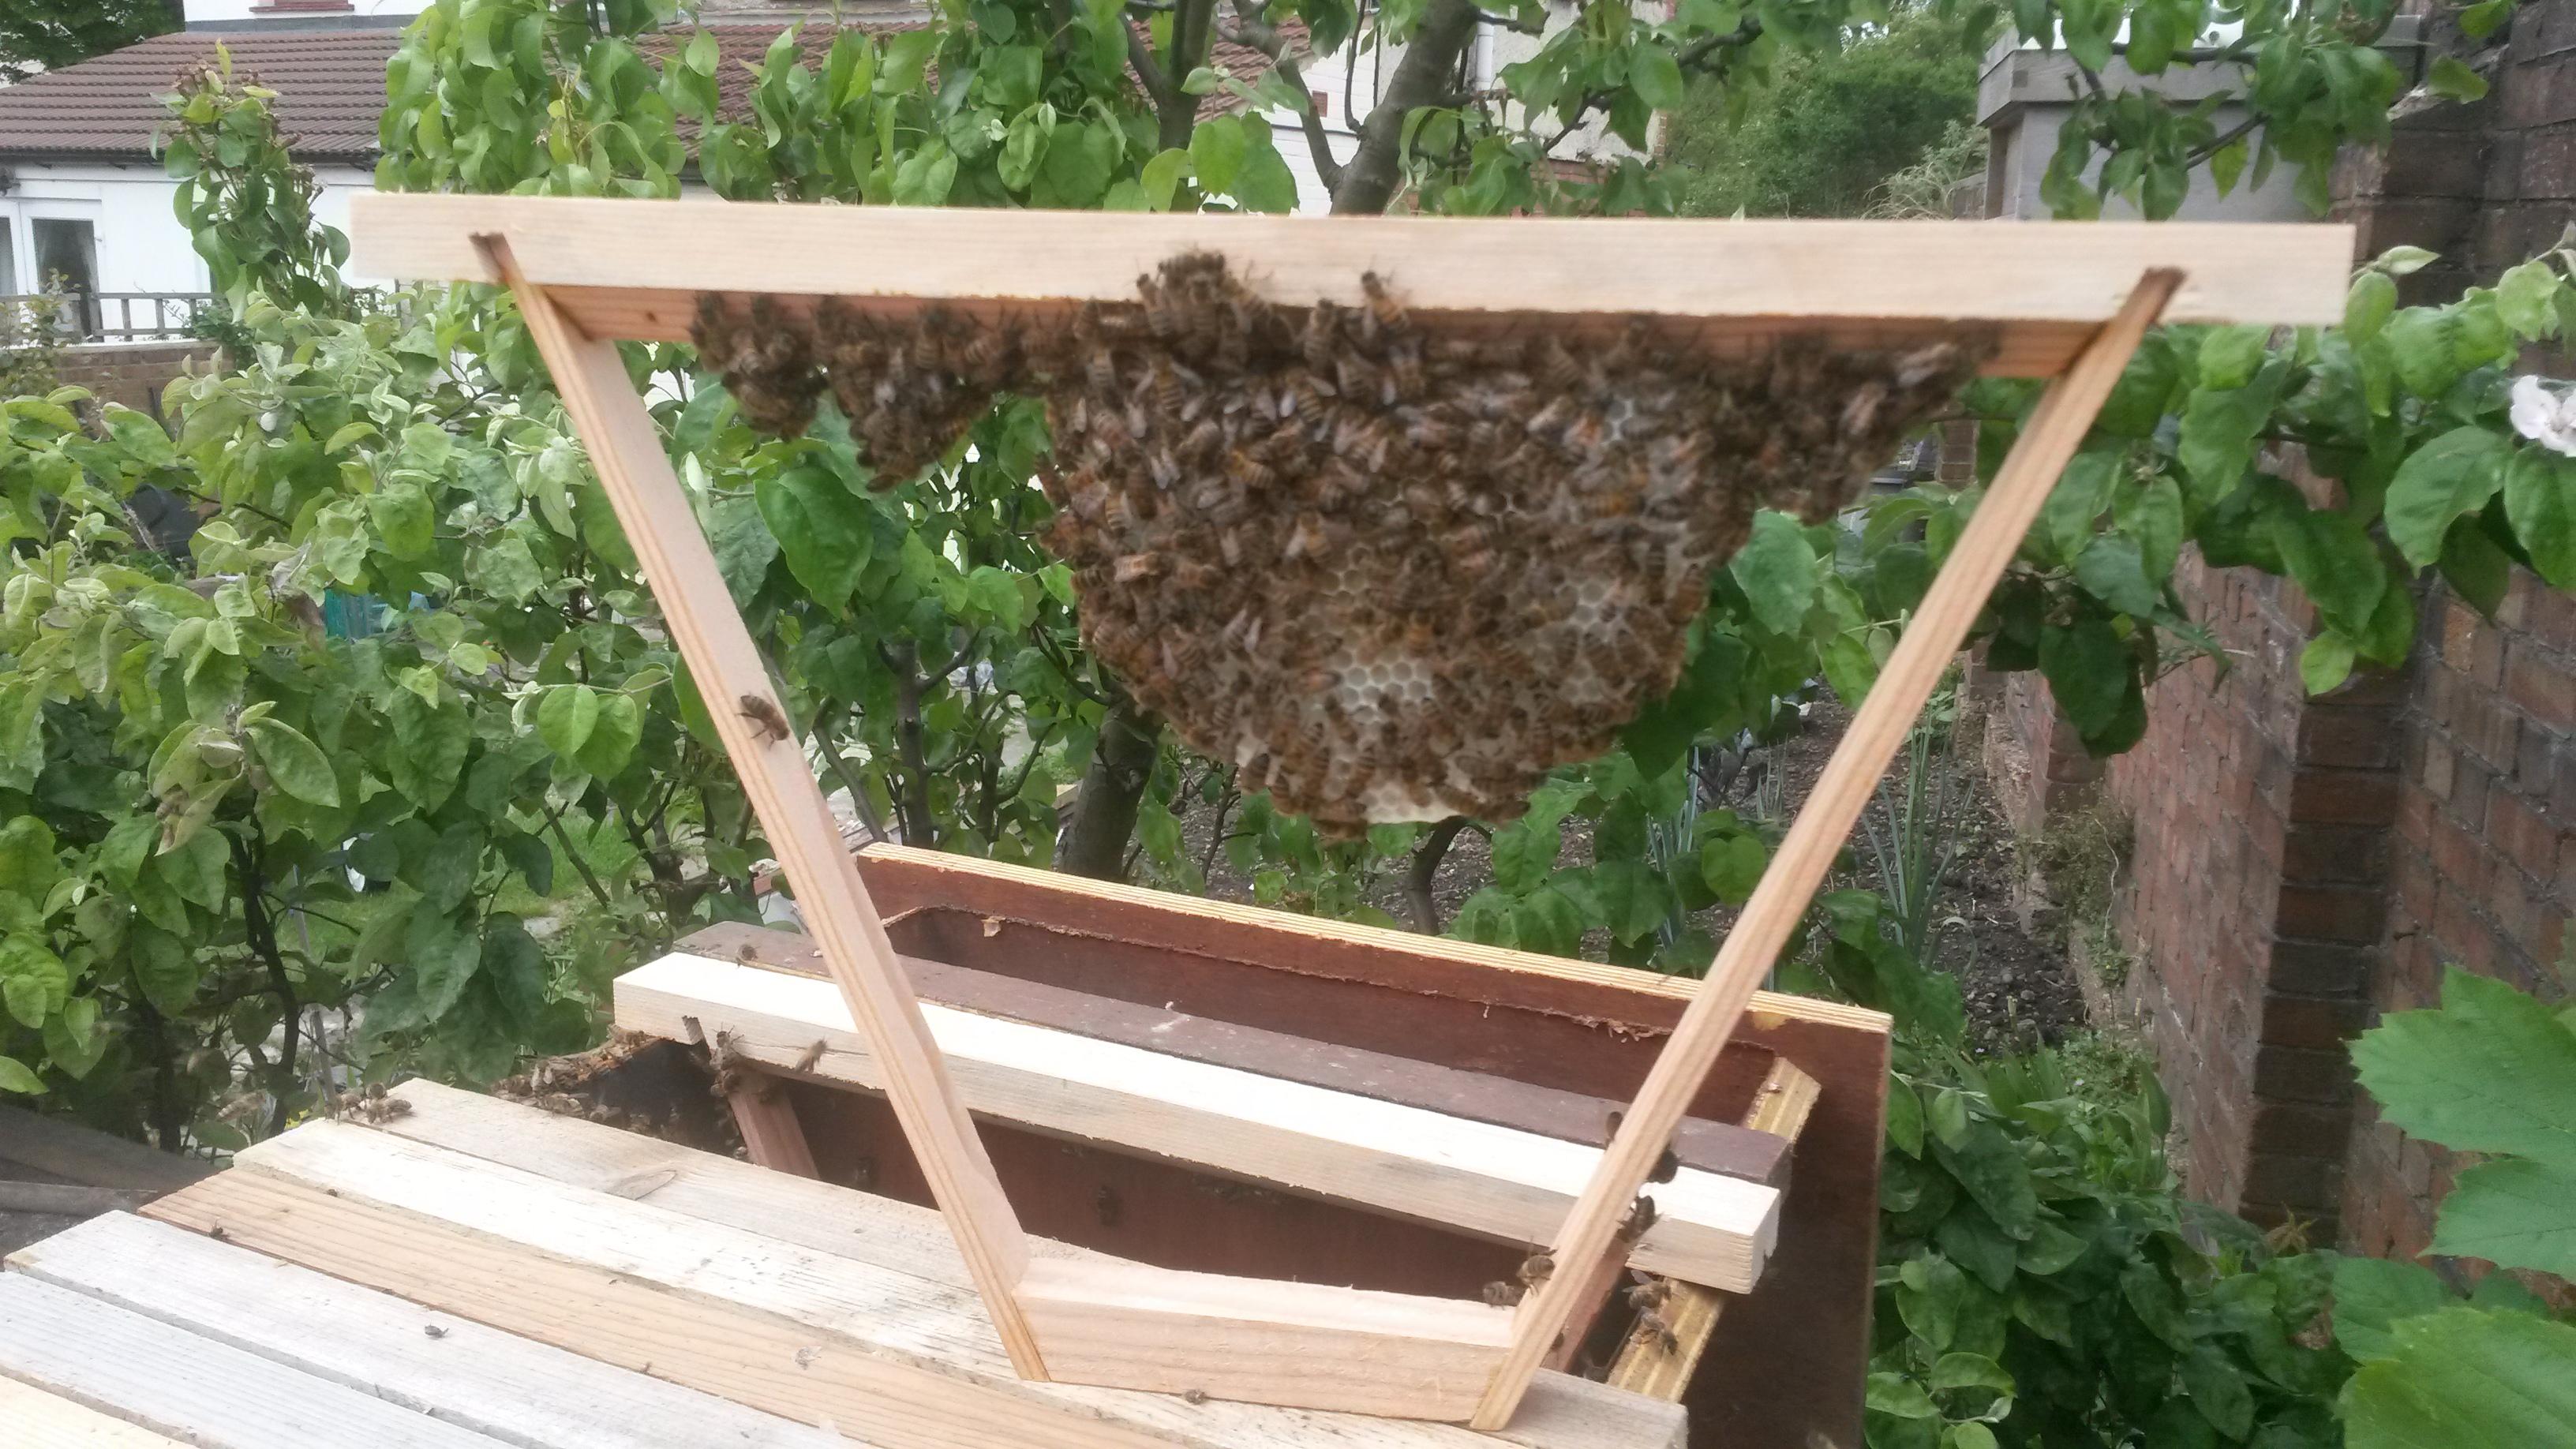 Top Bar Hive frames | Beekeeping afloat